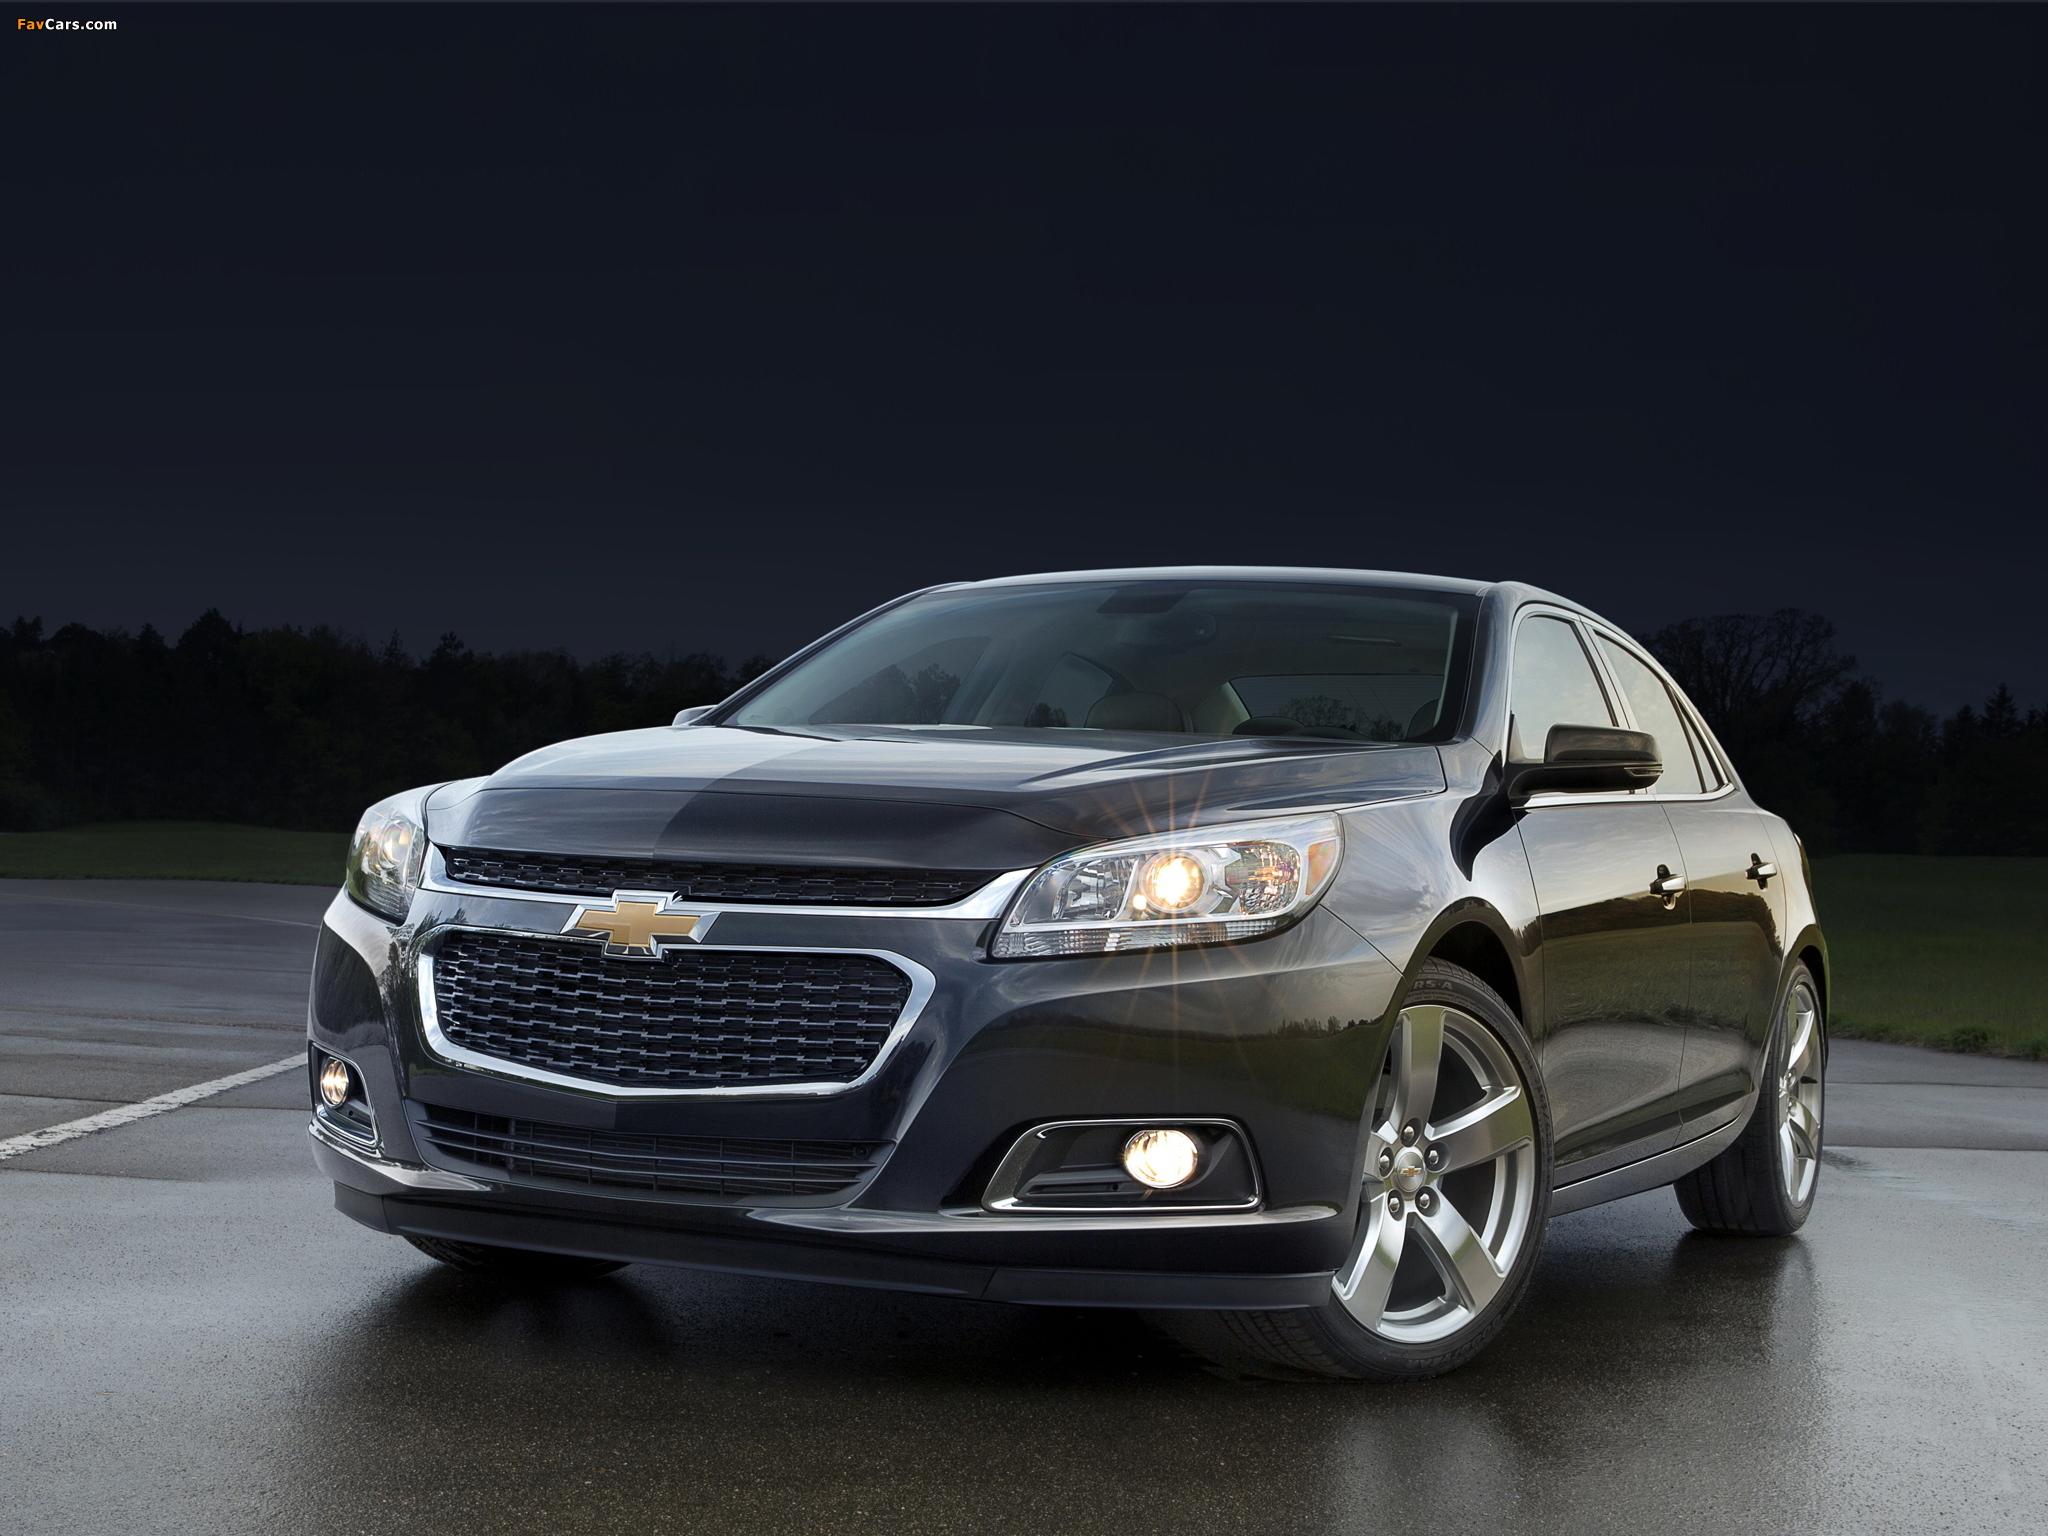 Chevrolet Malibu 2013 pictures (2048 x 1536)